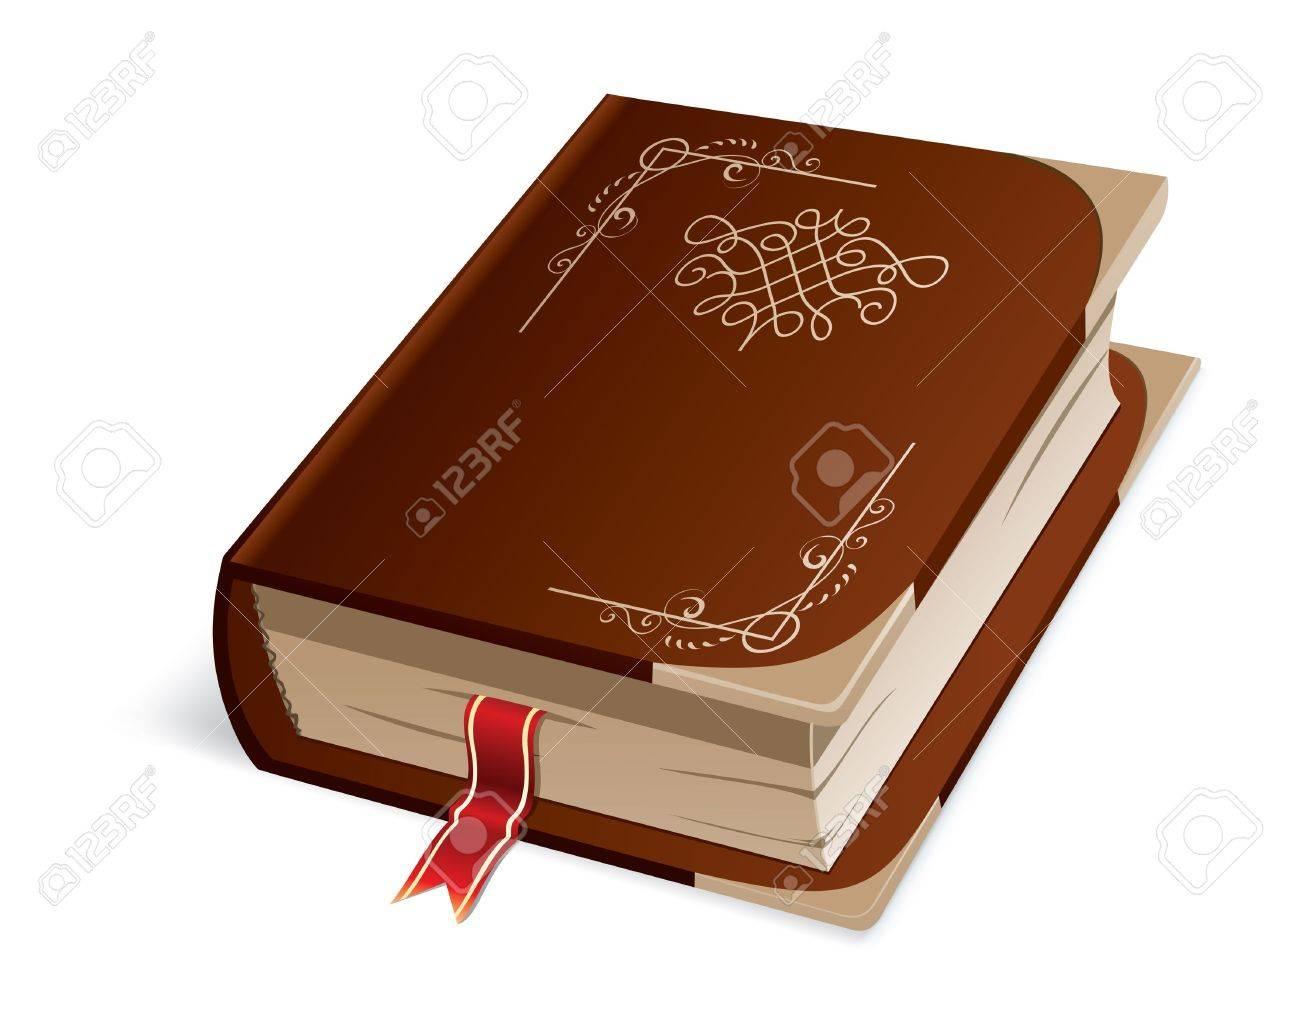 Hardcover Book Stock Vector - 14284120